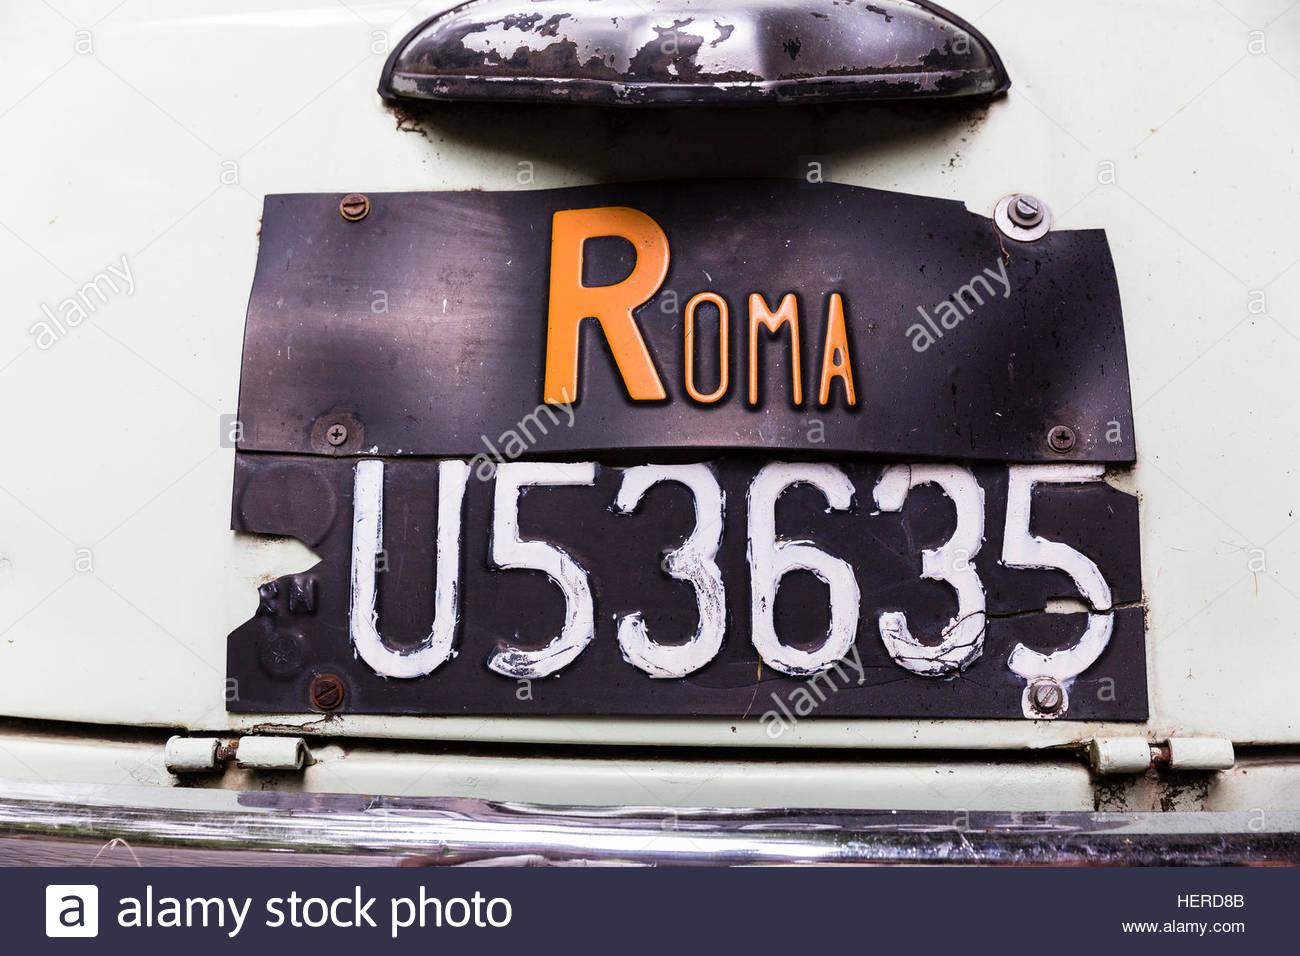 Archivierung, Stoßstange, Capital Cities, Auto, Oldtimer, Close-Up, Farbe Bild, Fiat 500 L, Horizontal, keine Stockbild